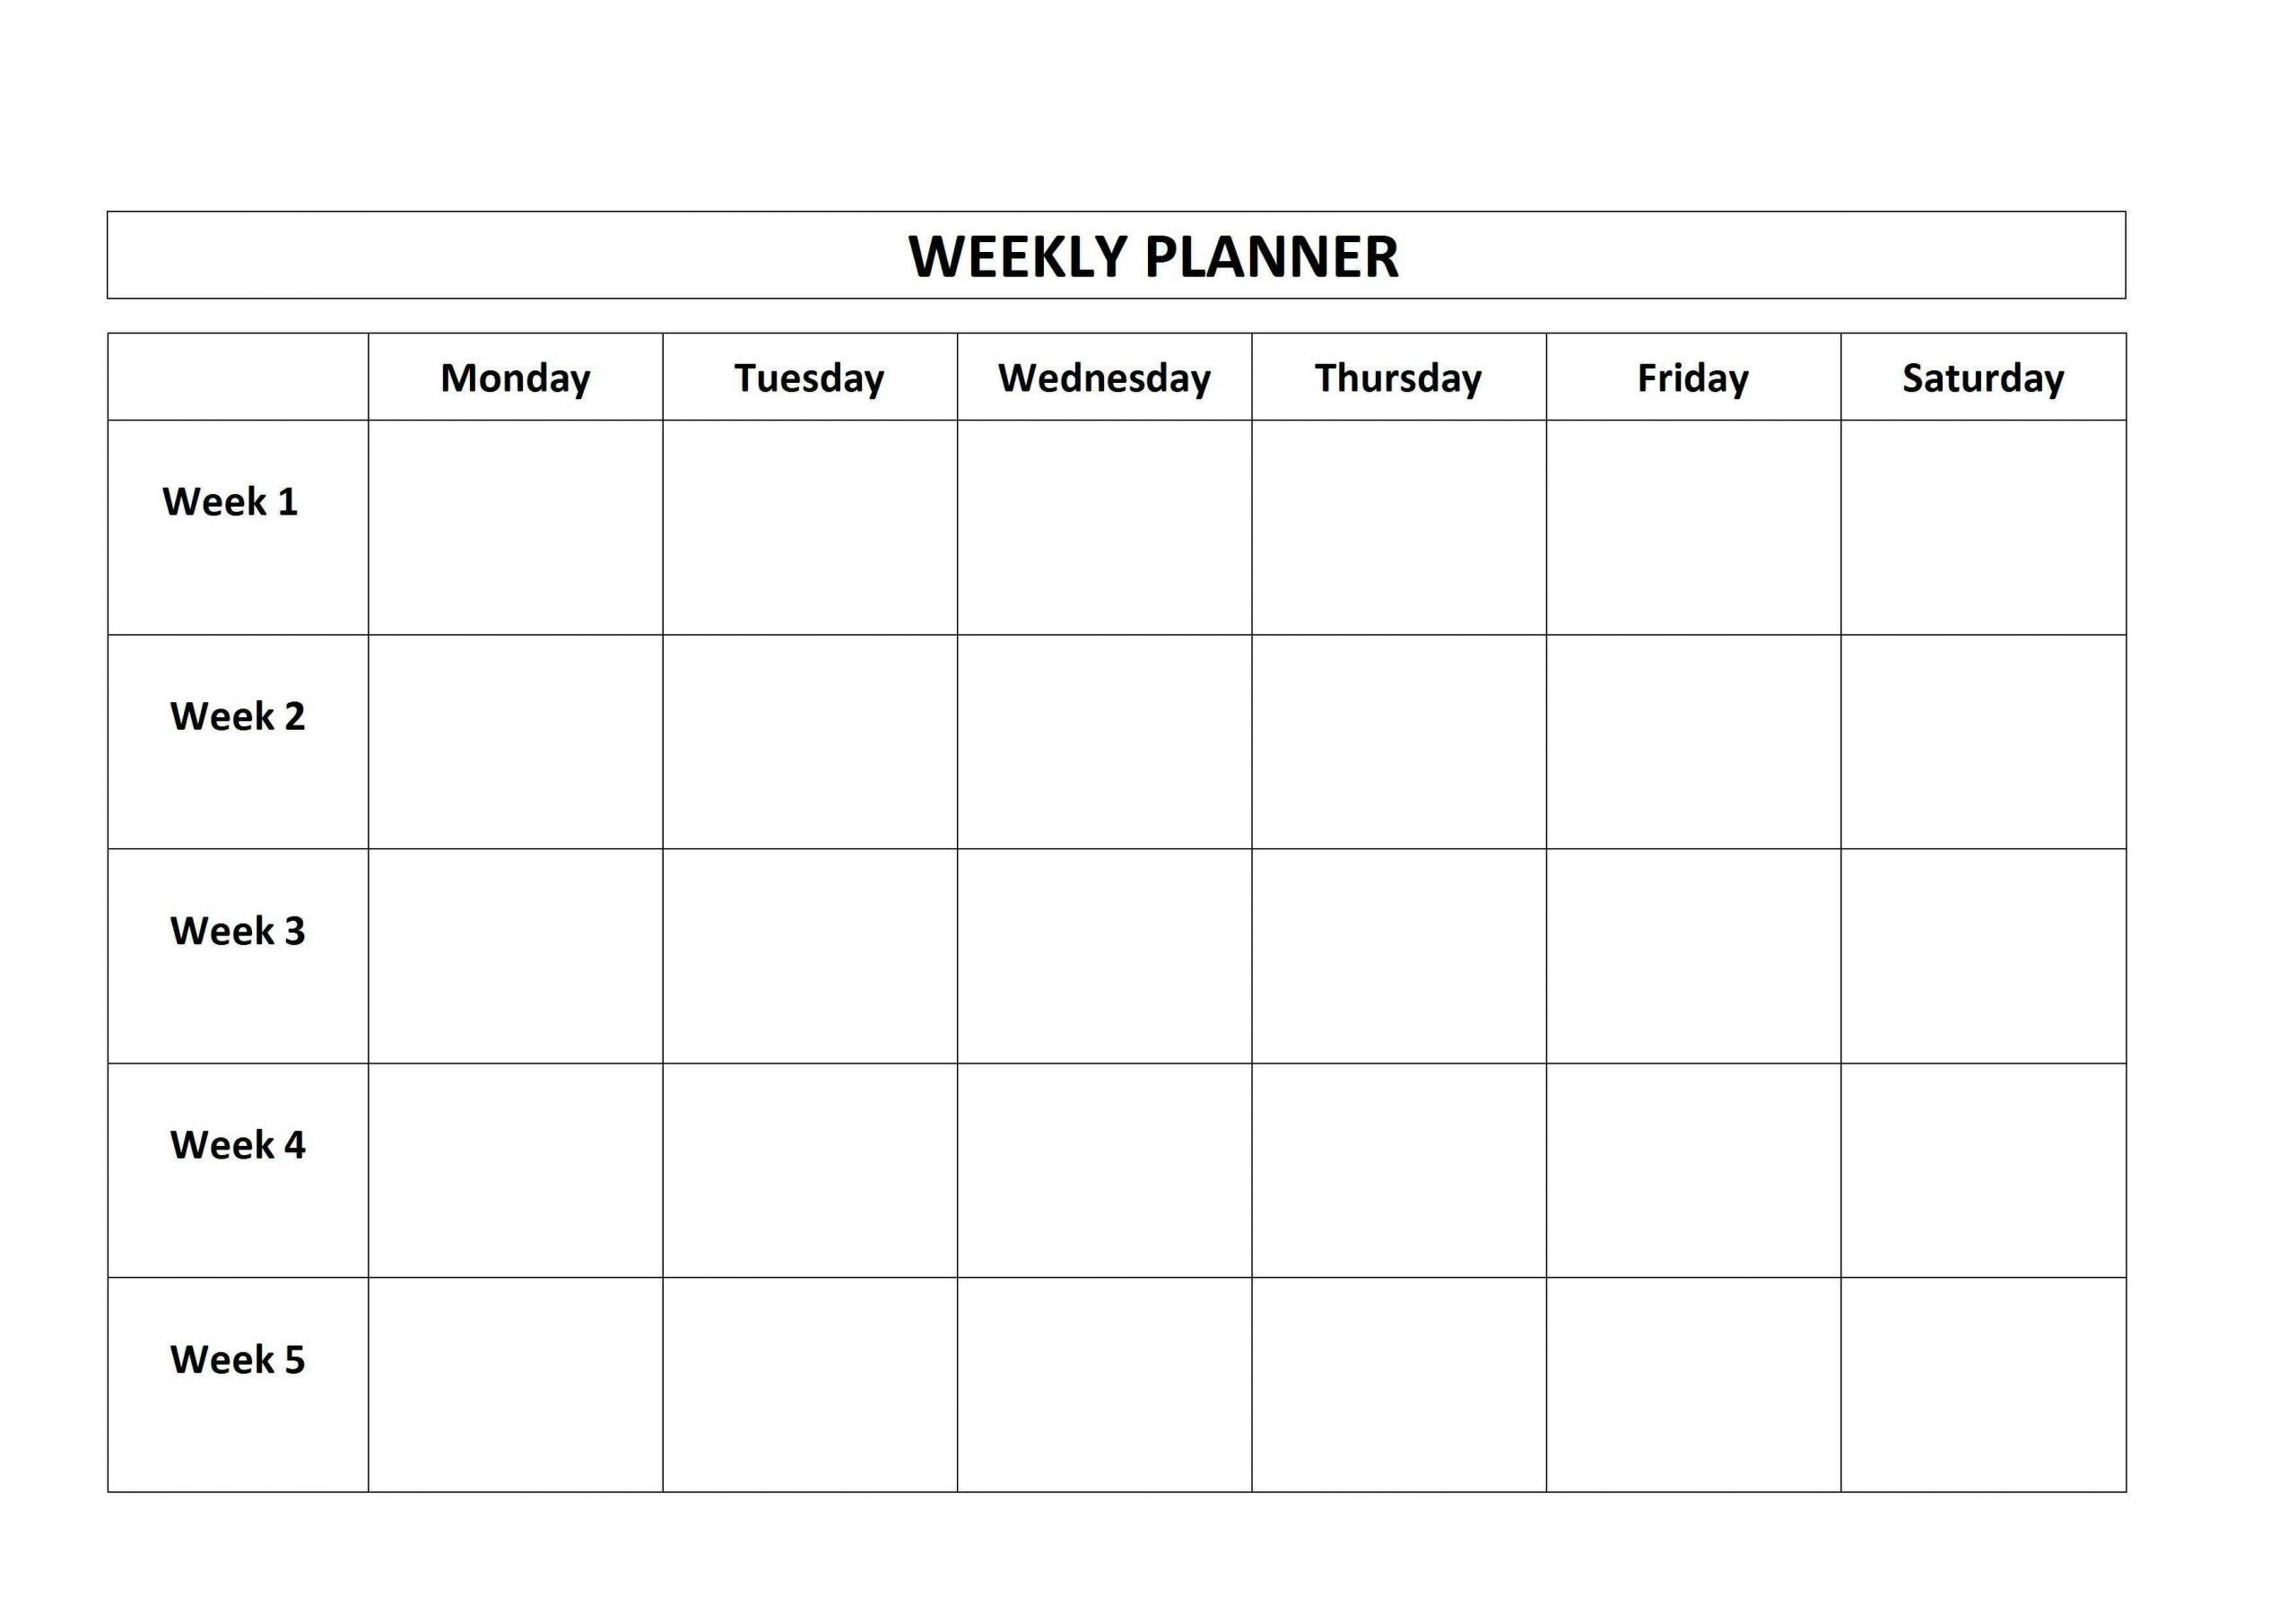 Blank Monday Through Friday Calendars | Example Calendar Weekly Calendar Monday - Friday